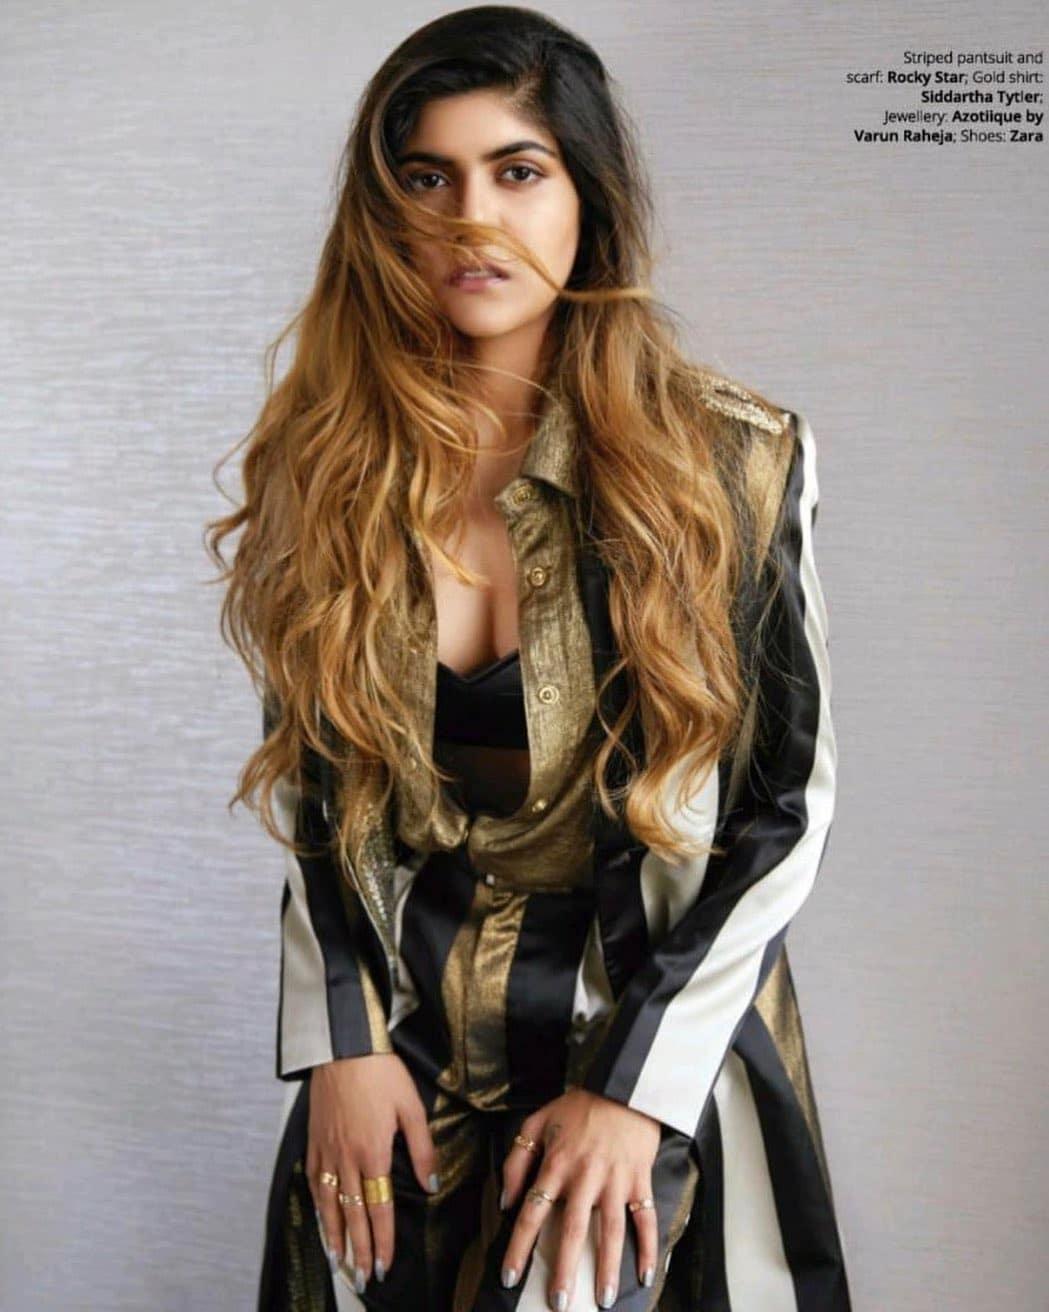 Ananya Birla Indian Entrepreneur, Singer